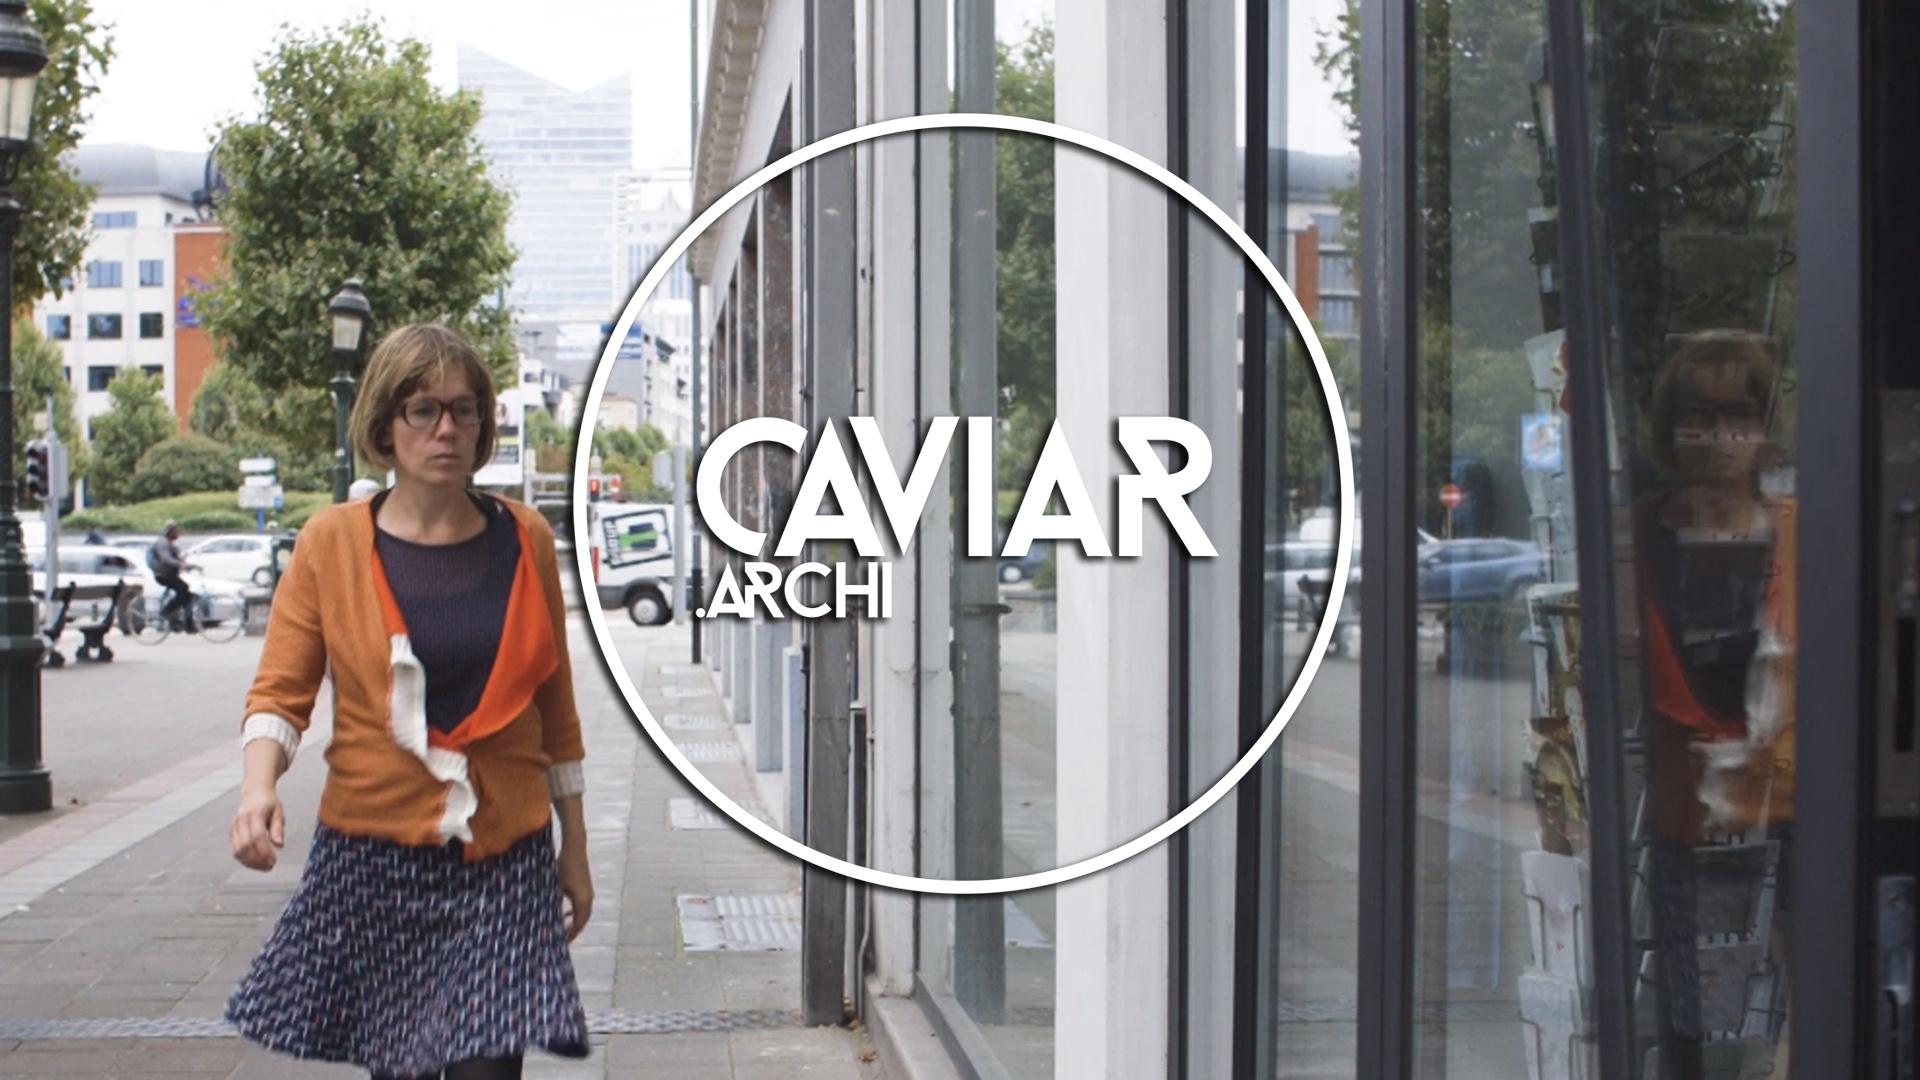 Alive architecture portrait of petra pferdmenges caviar archi